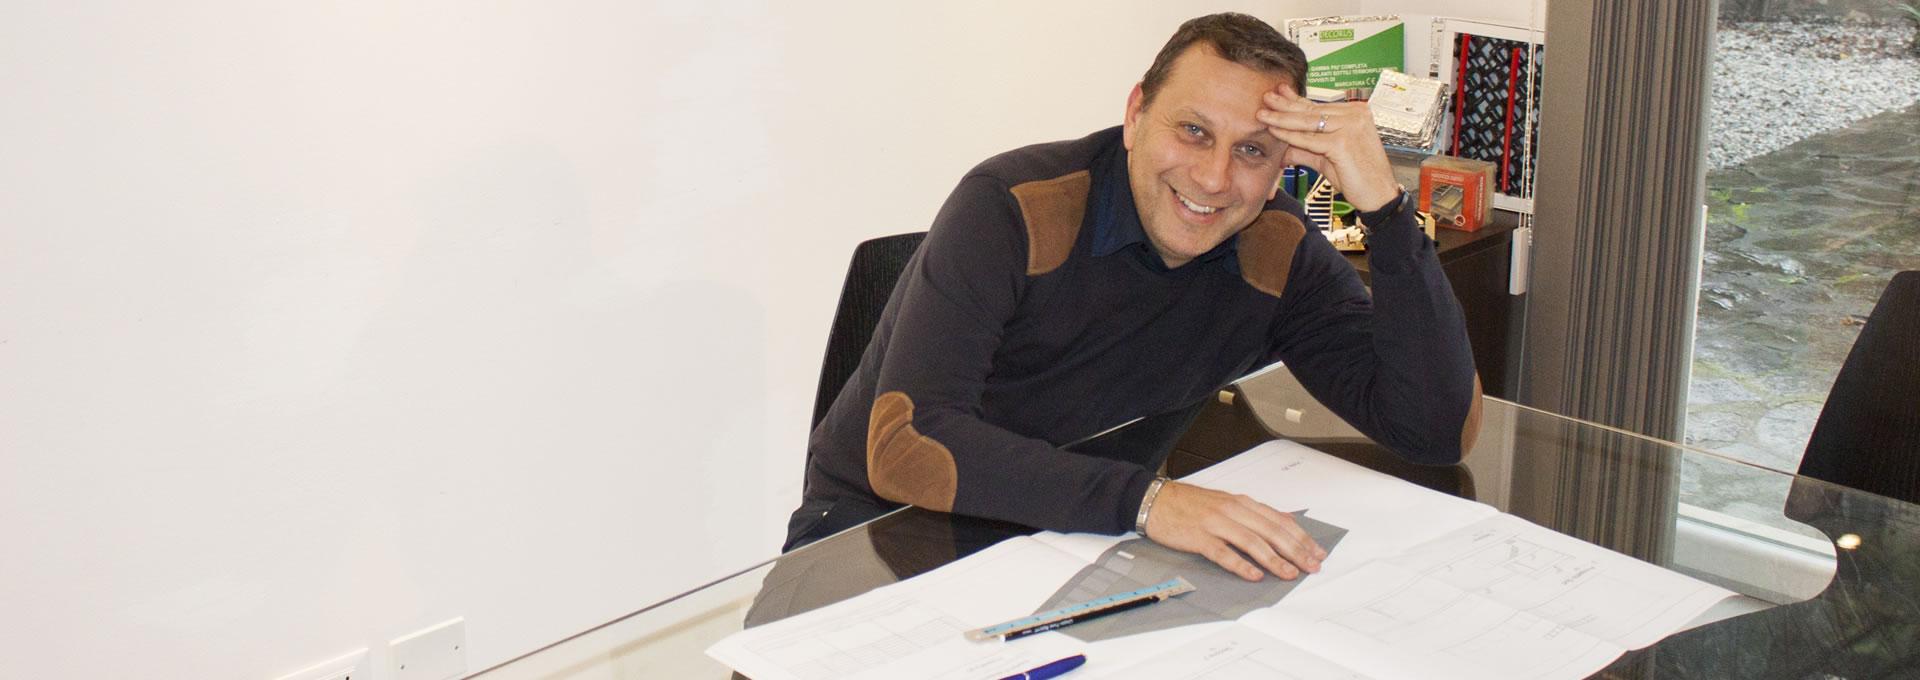 Antares Progettazione - Ing. Mario Acernese